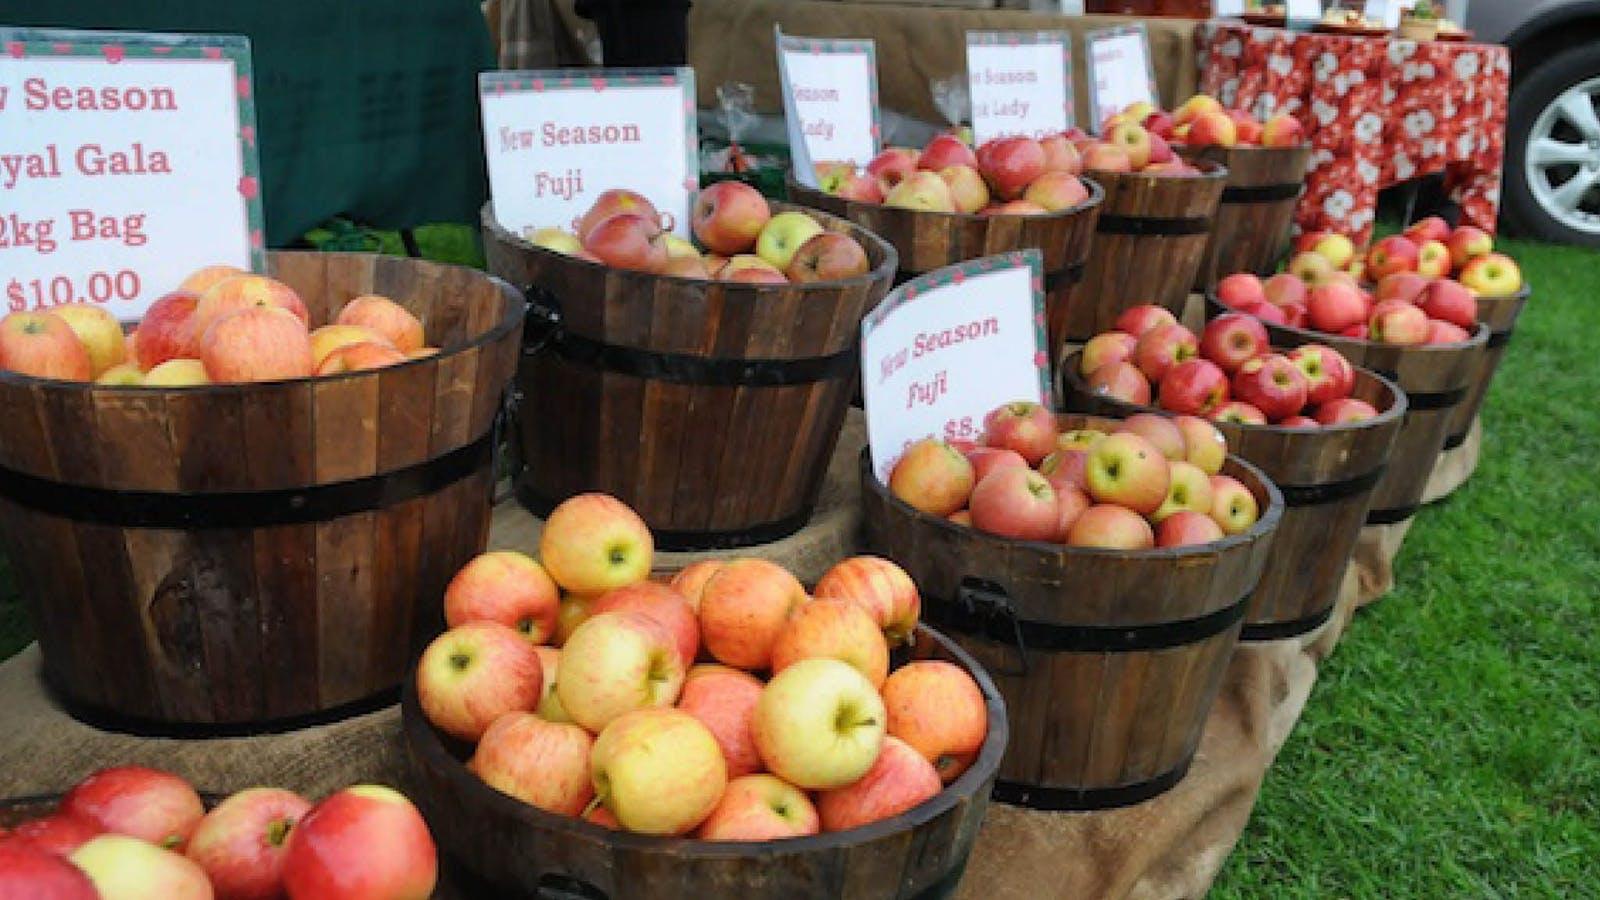 Coburg Fruit and Veg